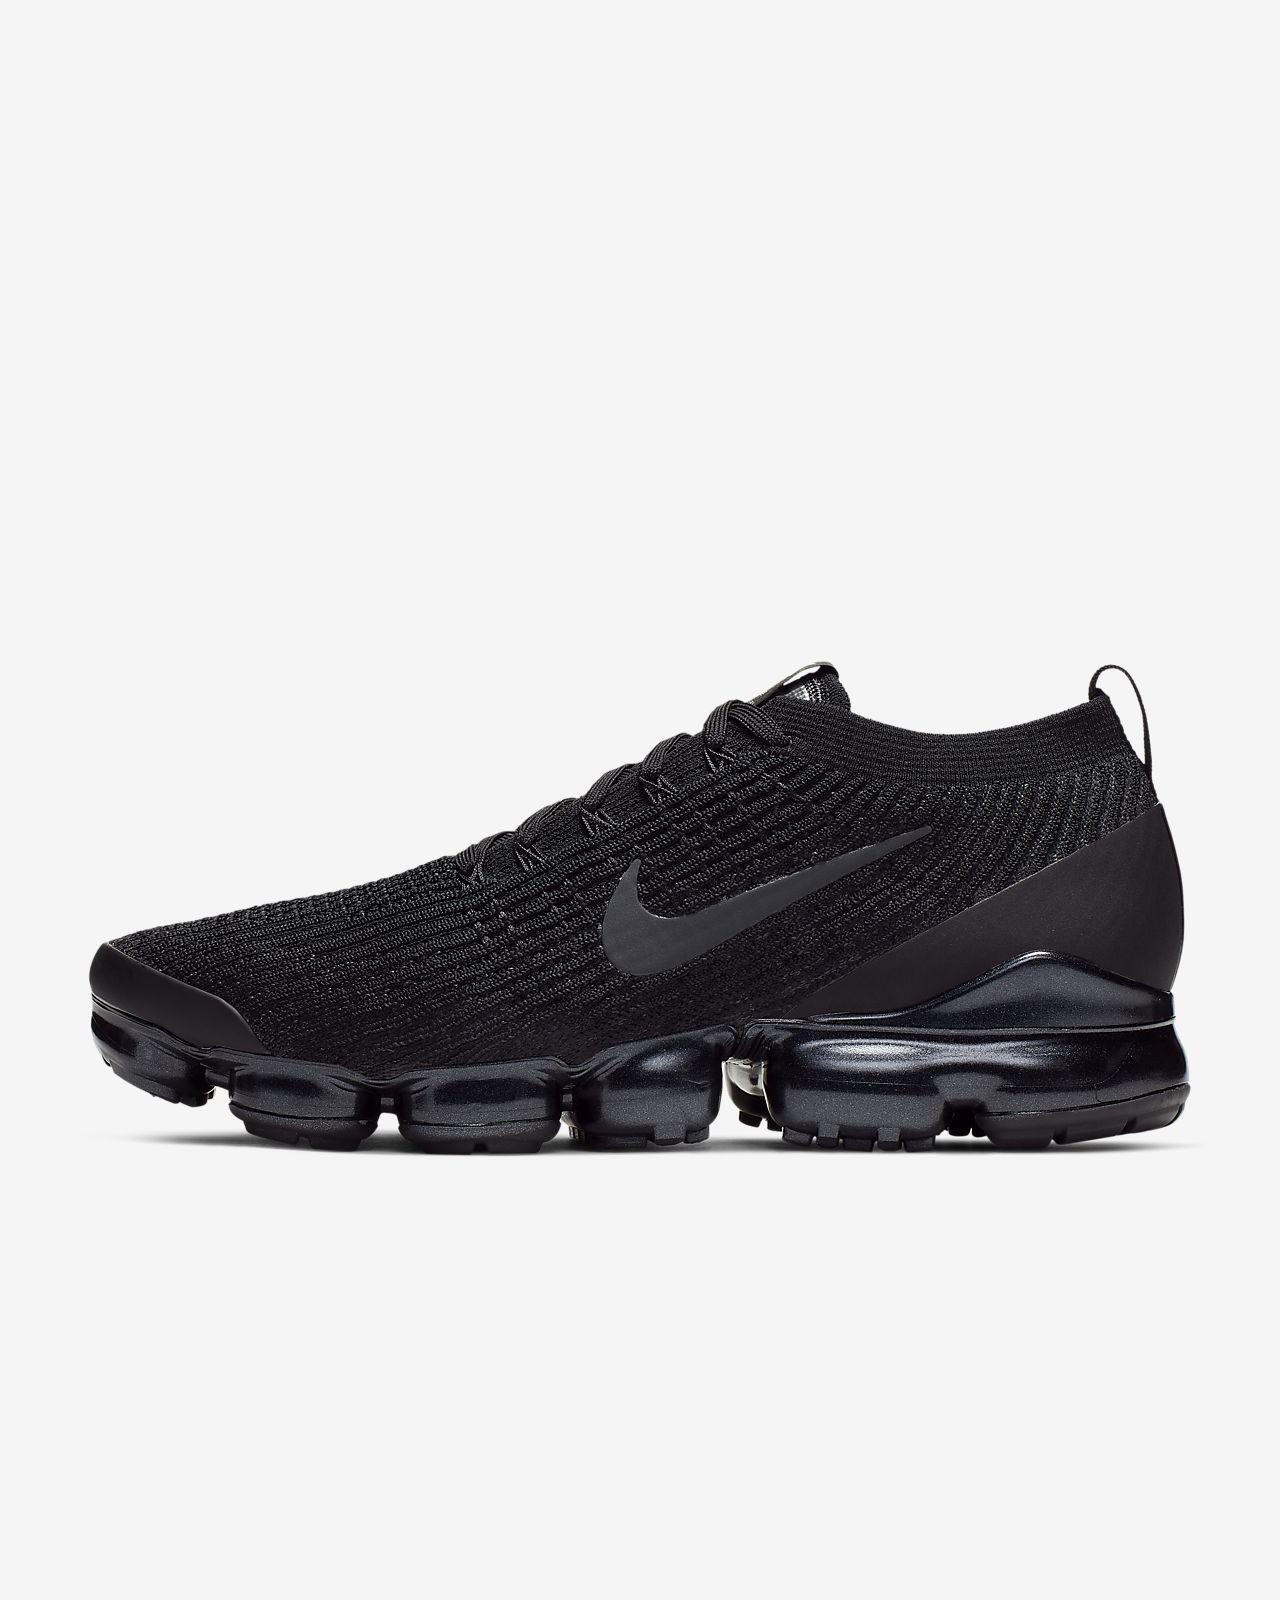 Nike Air Force 1 Low Hombre Nike Man Shoe Flyknit Naranja Y